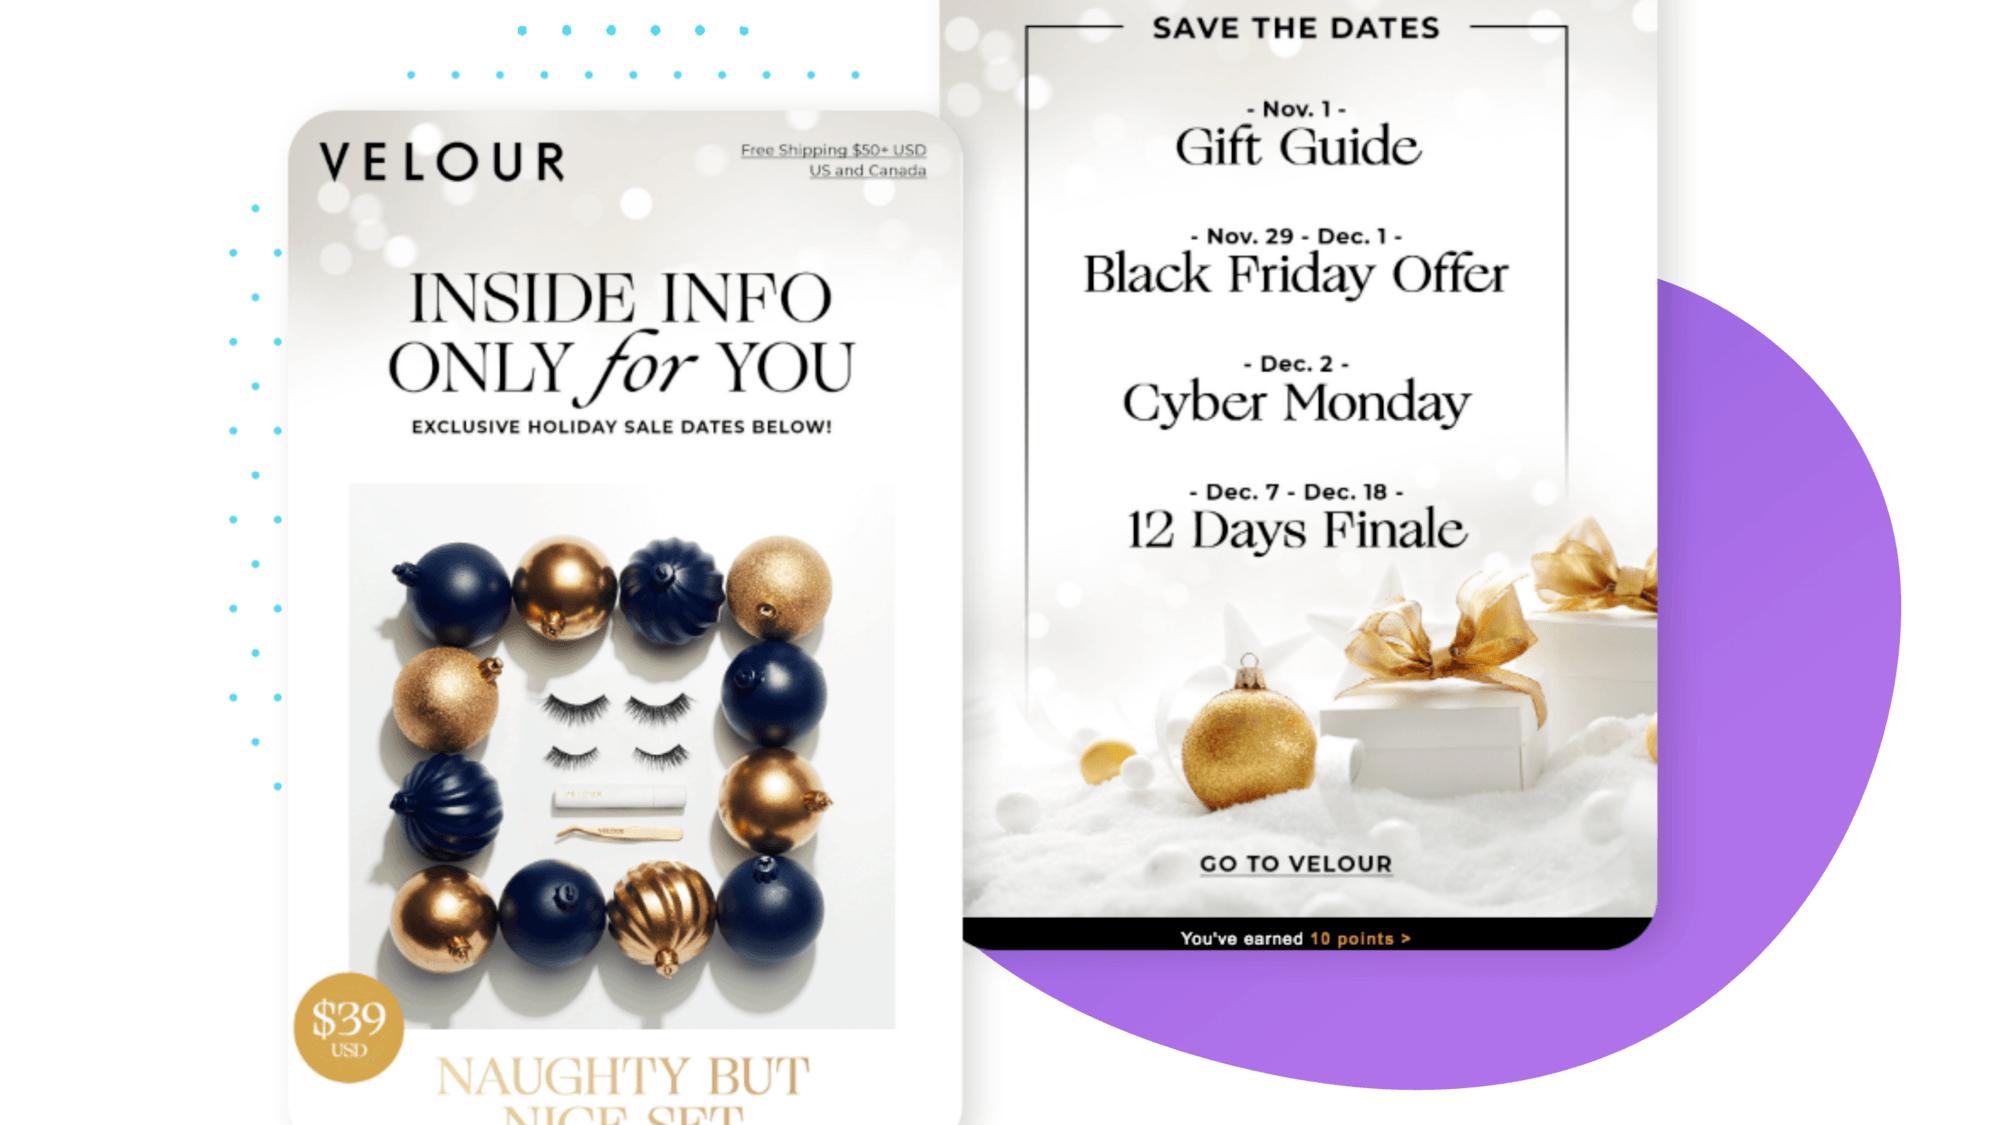 Velour Lashes Holiday Email Marketing Tips